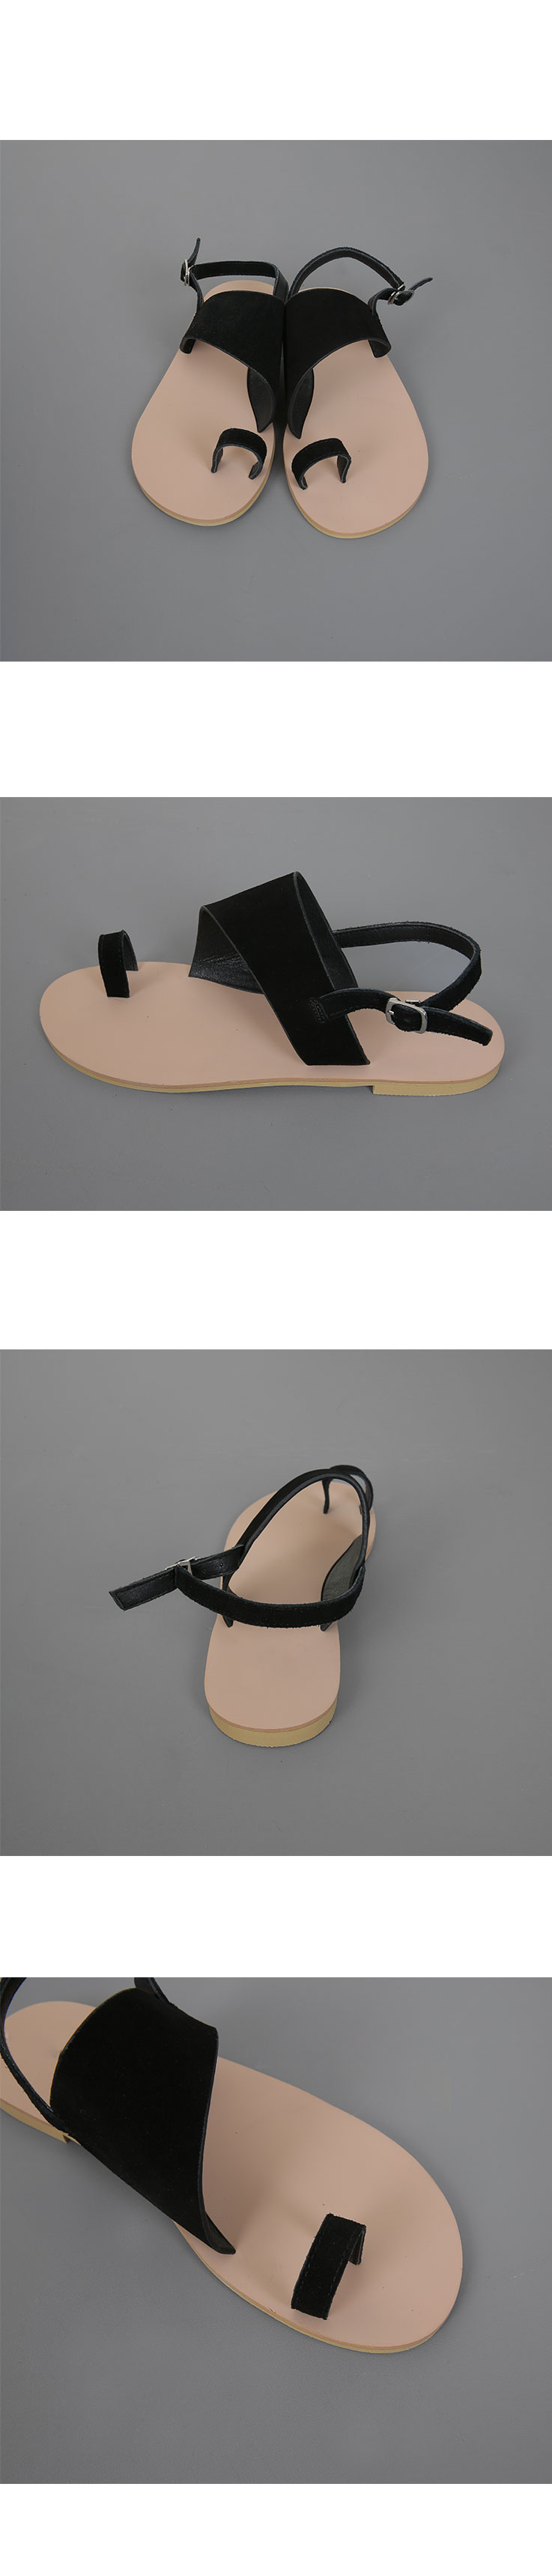 Knots-sandals